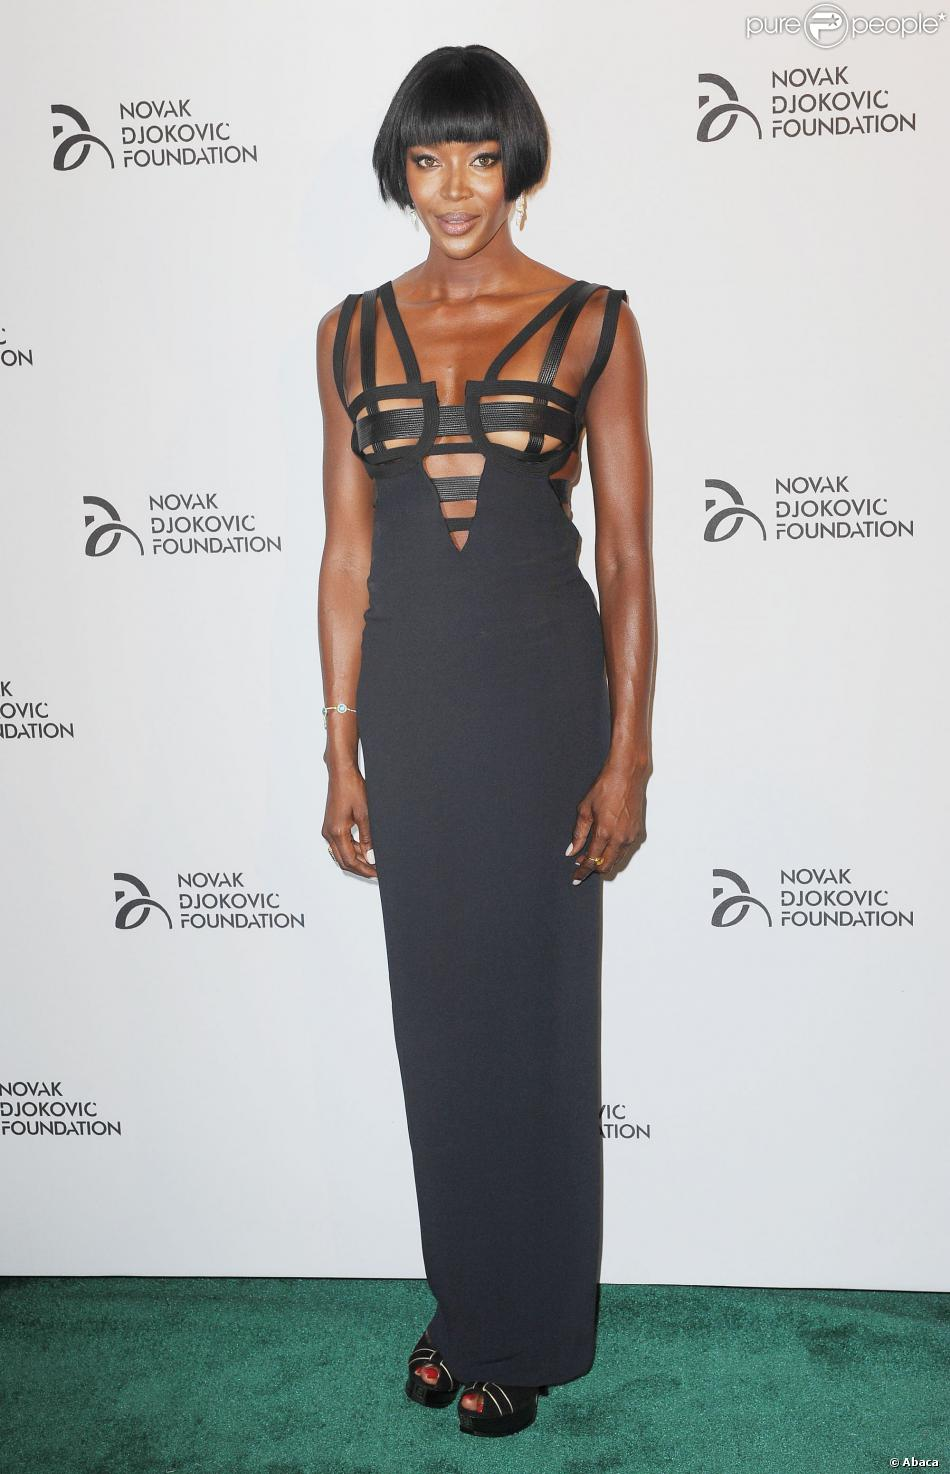 Naomi Campbell assiste au dîner de gala de la Novak Djokovic Foundation au Capitale. New York, le 10 septembre 2013.